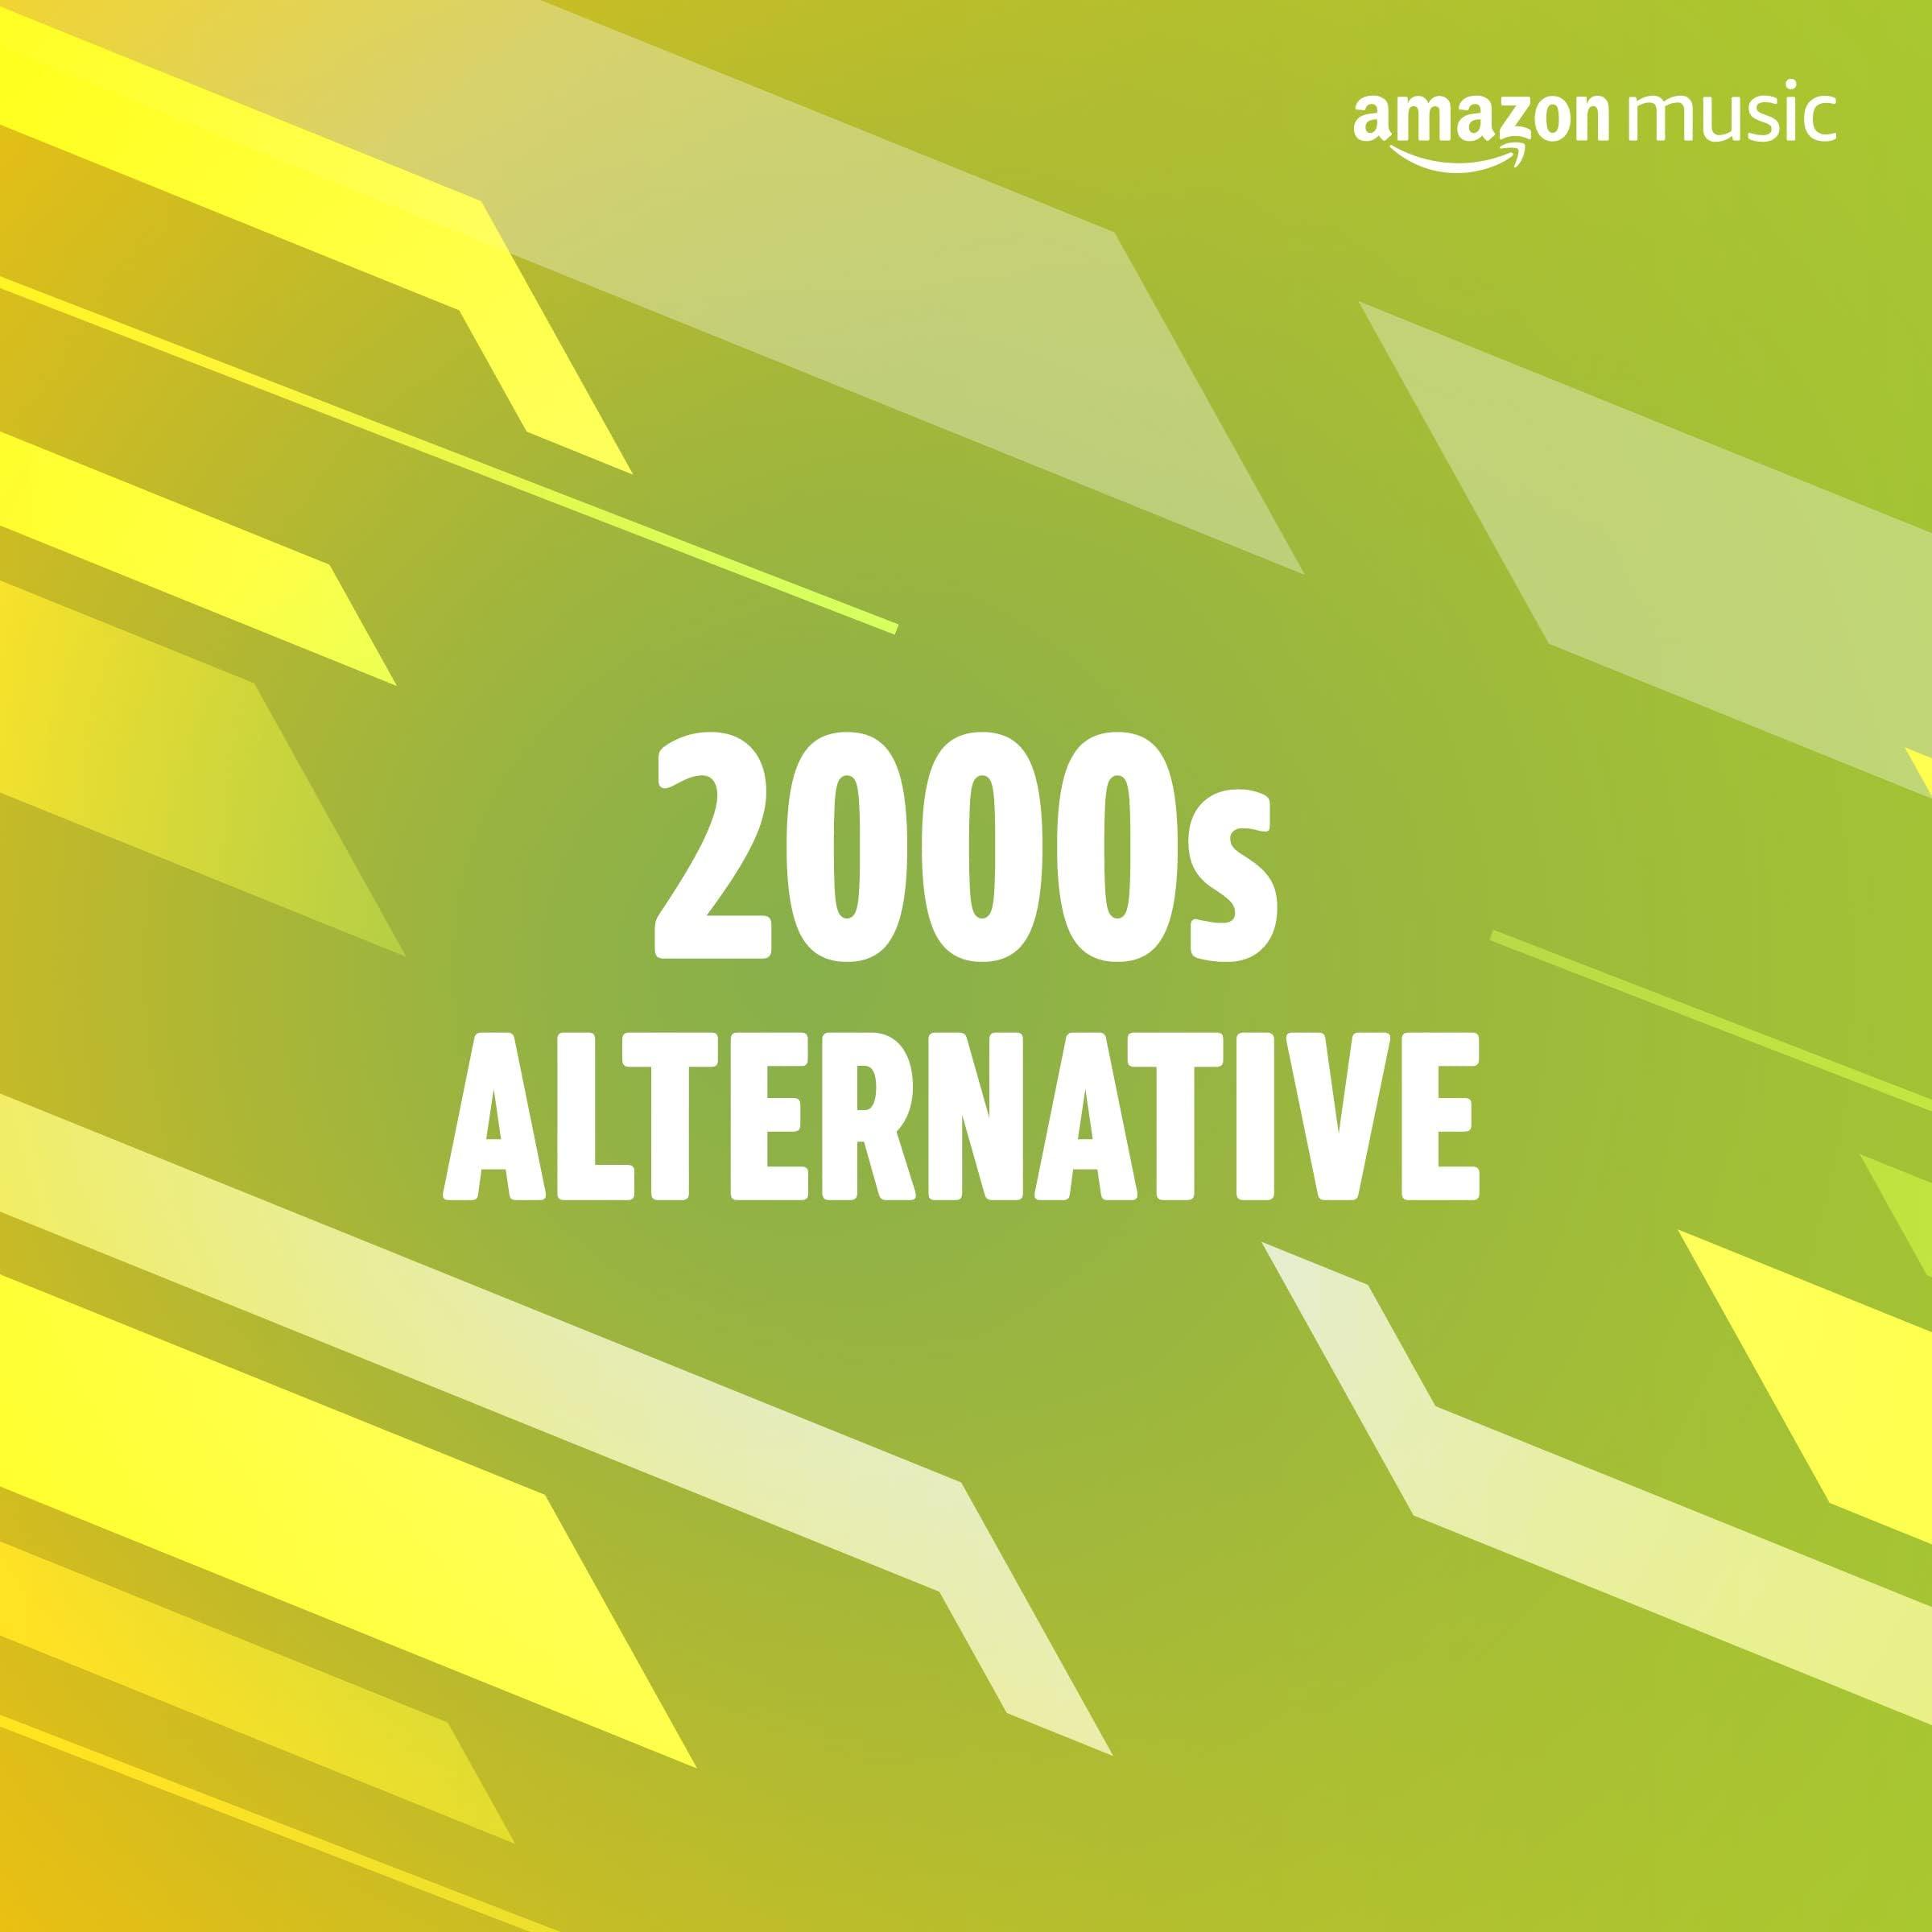 2000s Alternative